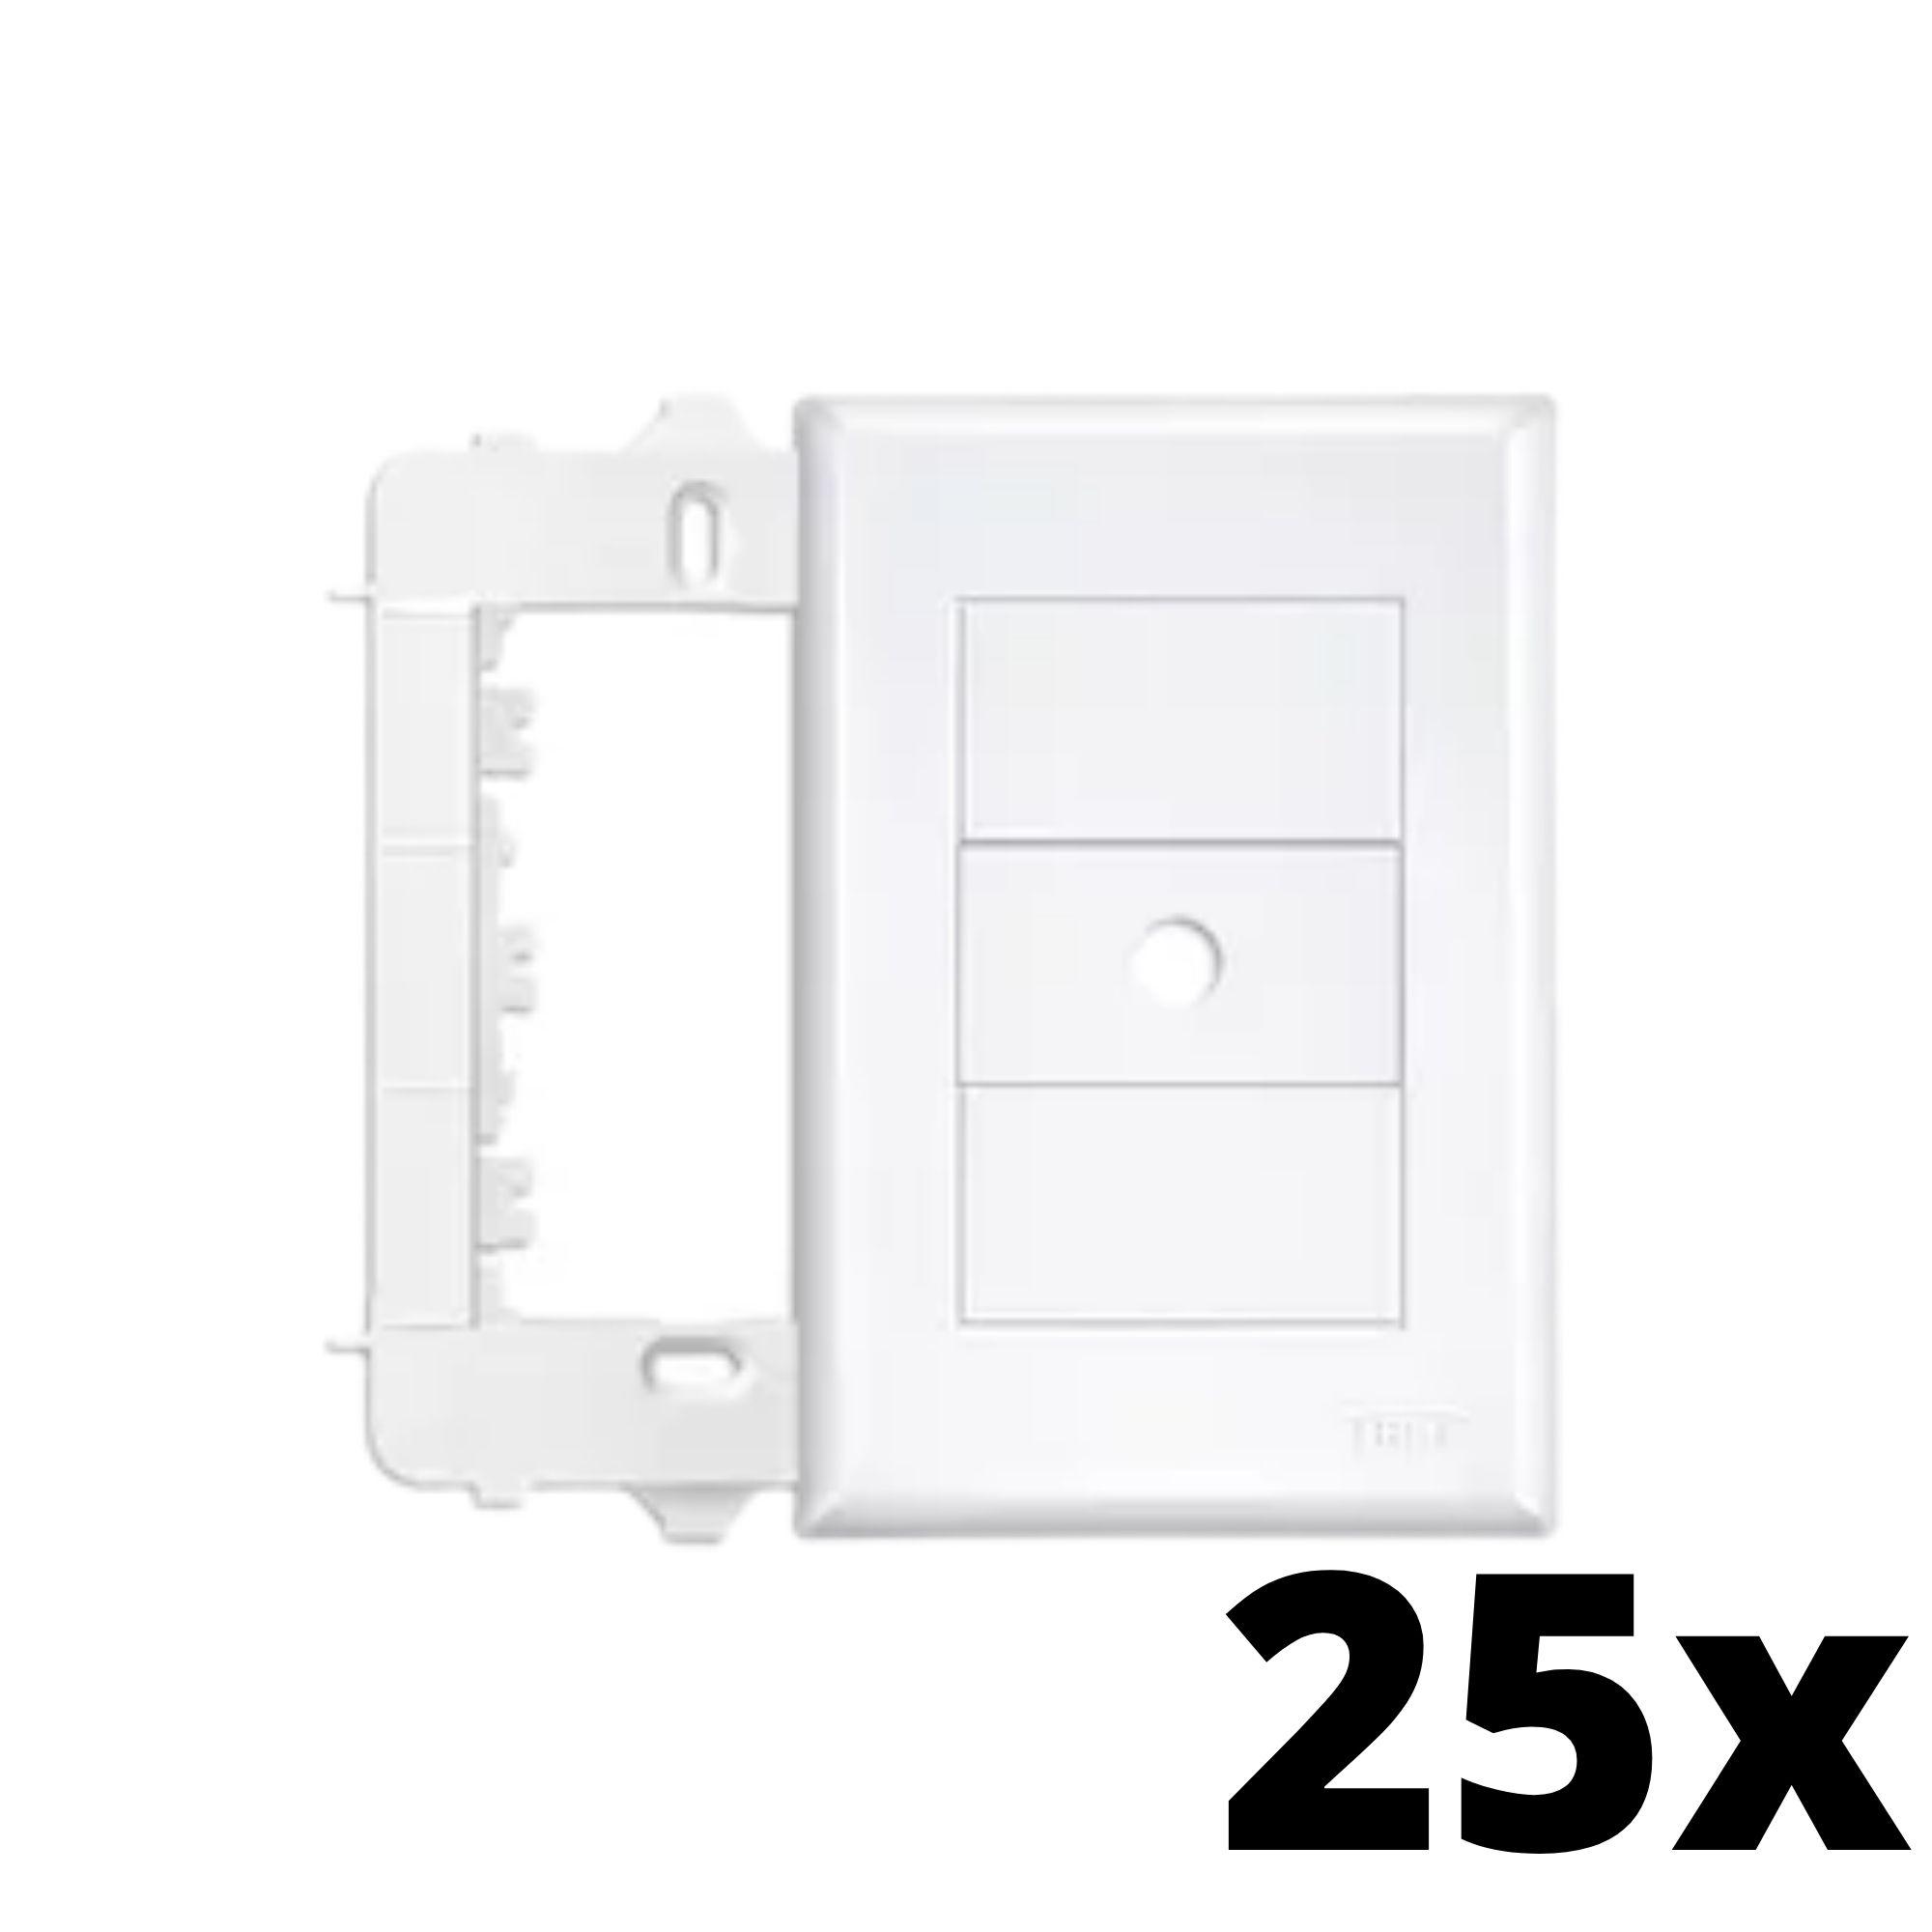 Kit 25 und Evidence Placa 4x2 Com Furo